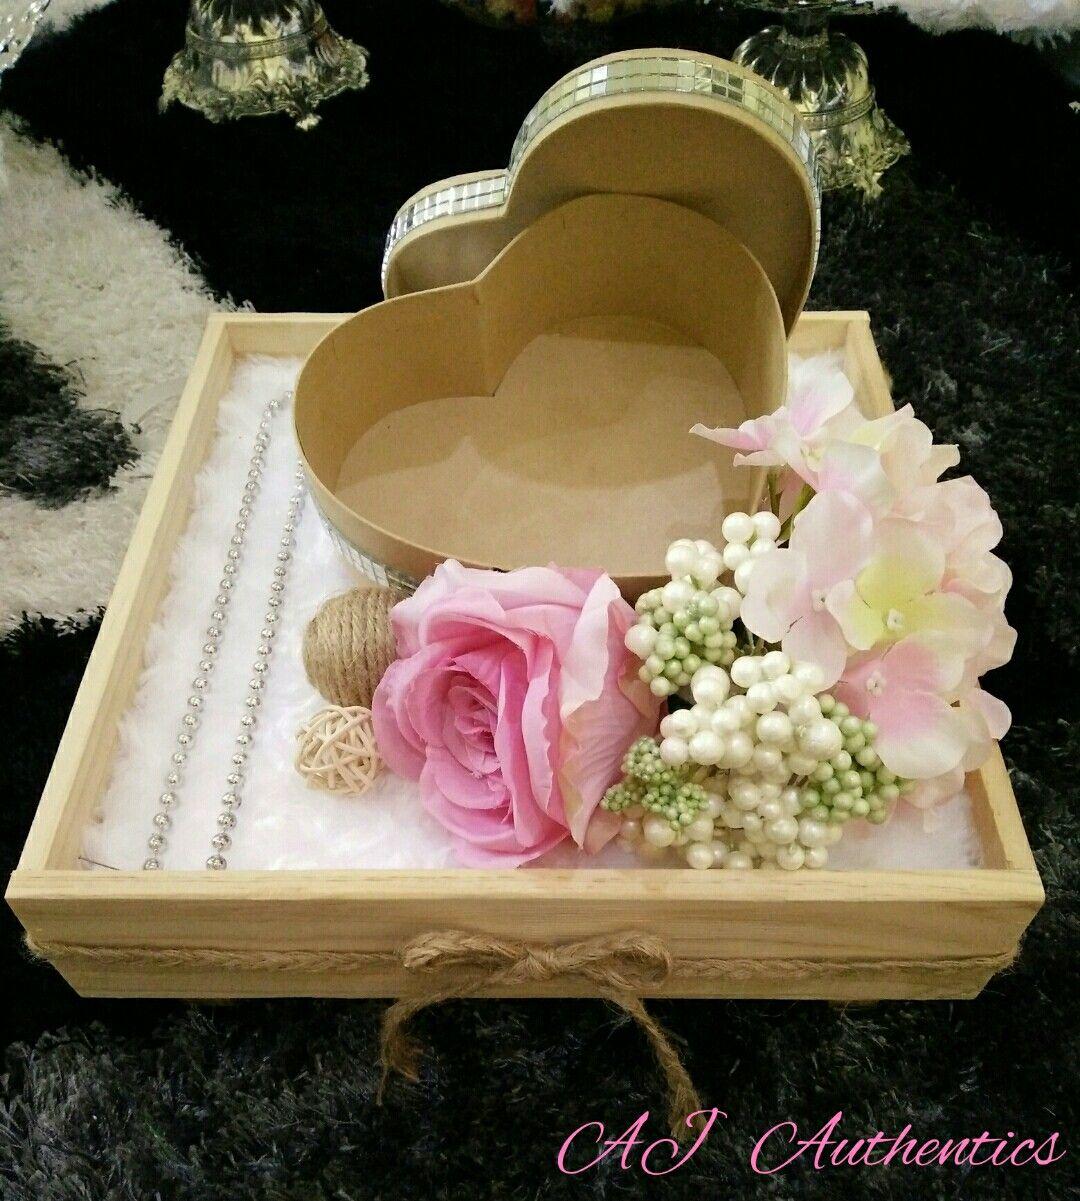 Soft pink sweety rental kedah rm25tray whatsapp 0126949020 soft pink sweety rental kedah rm25tray whatsapp 0126949020 junglespirit Gallery